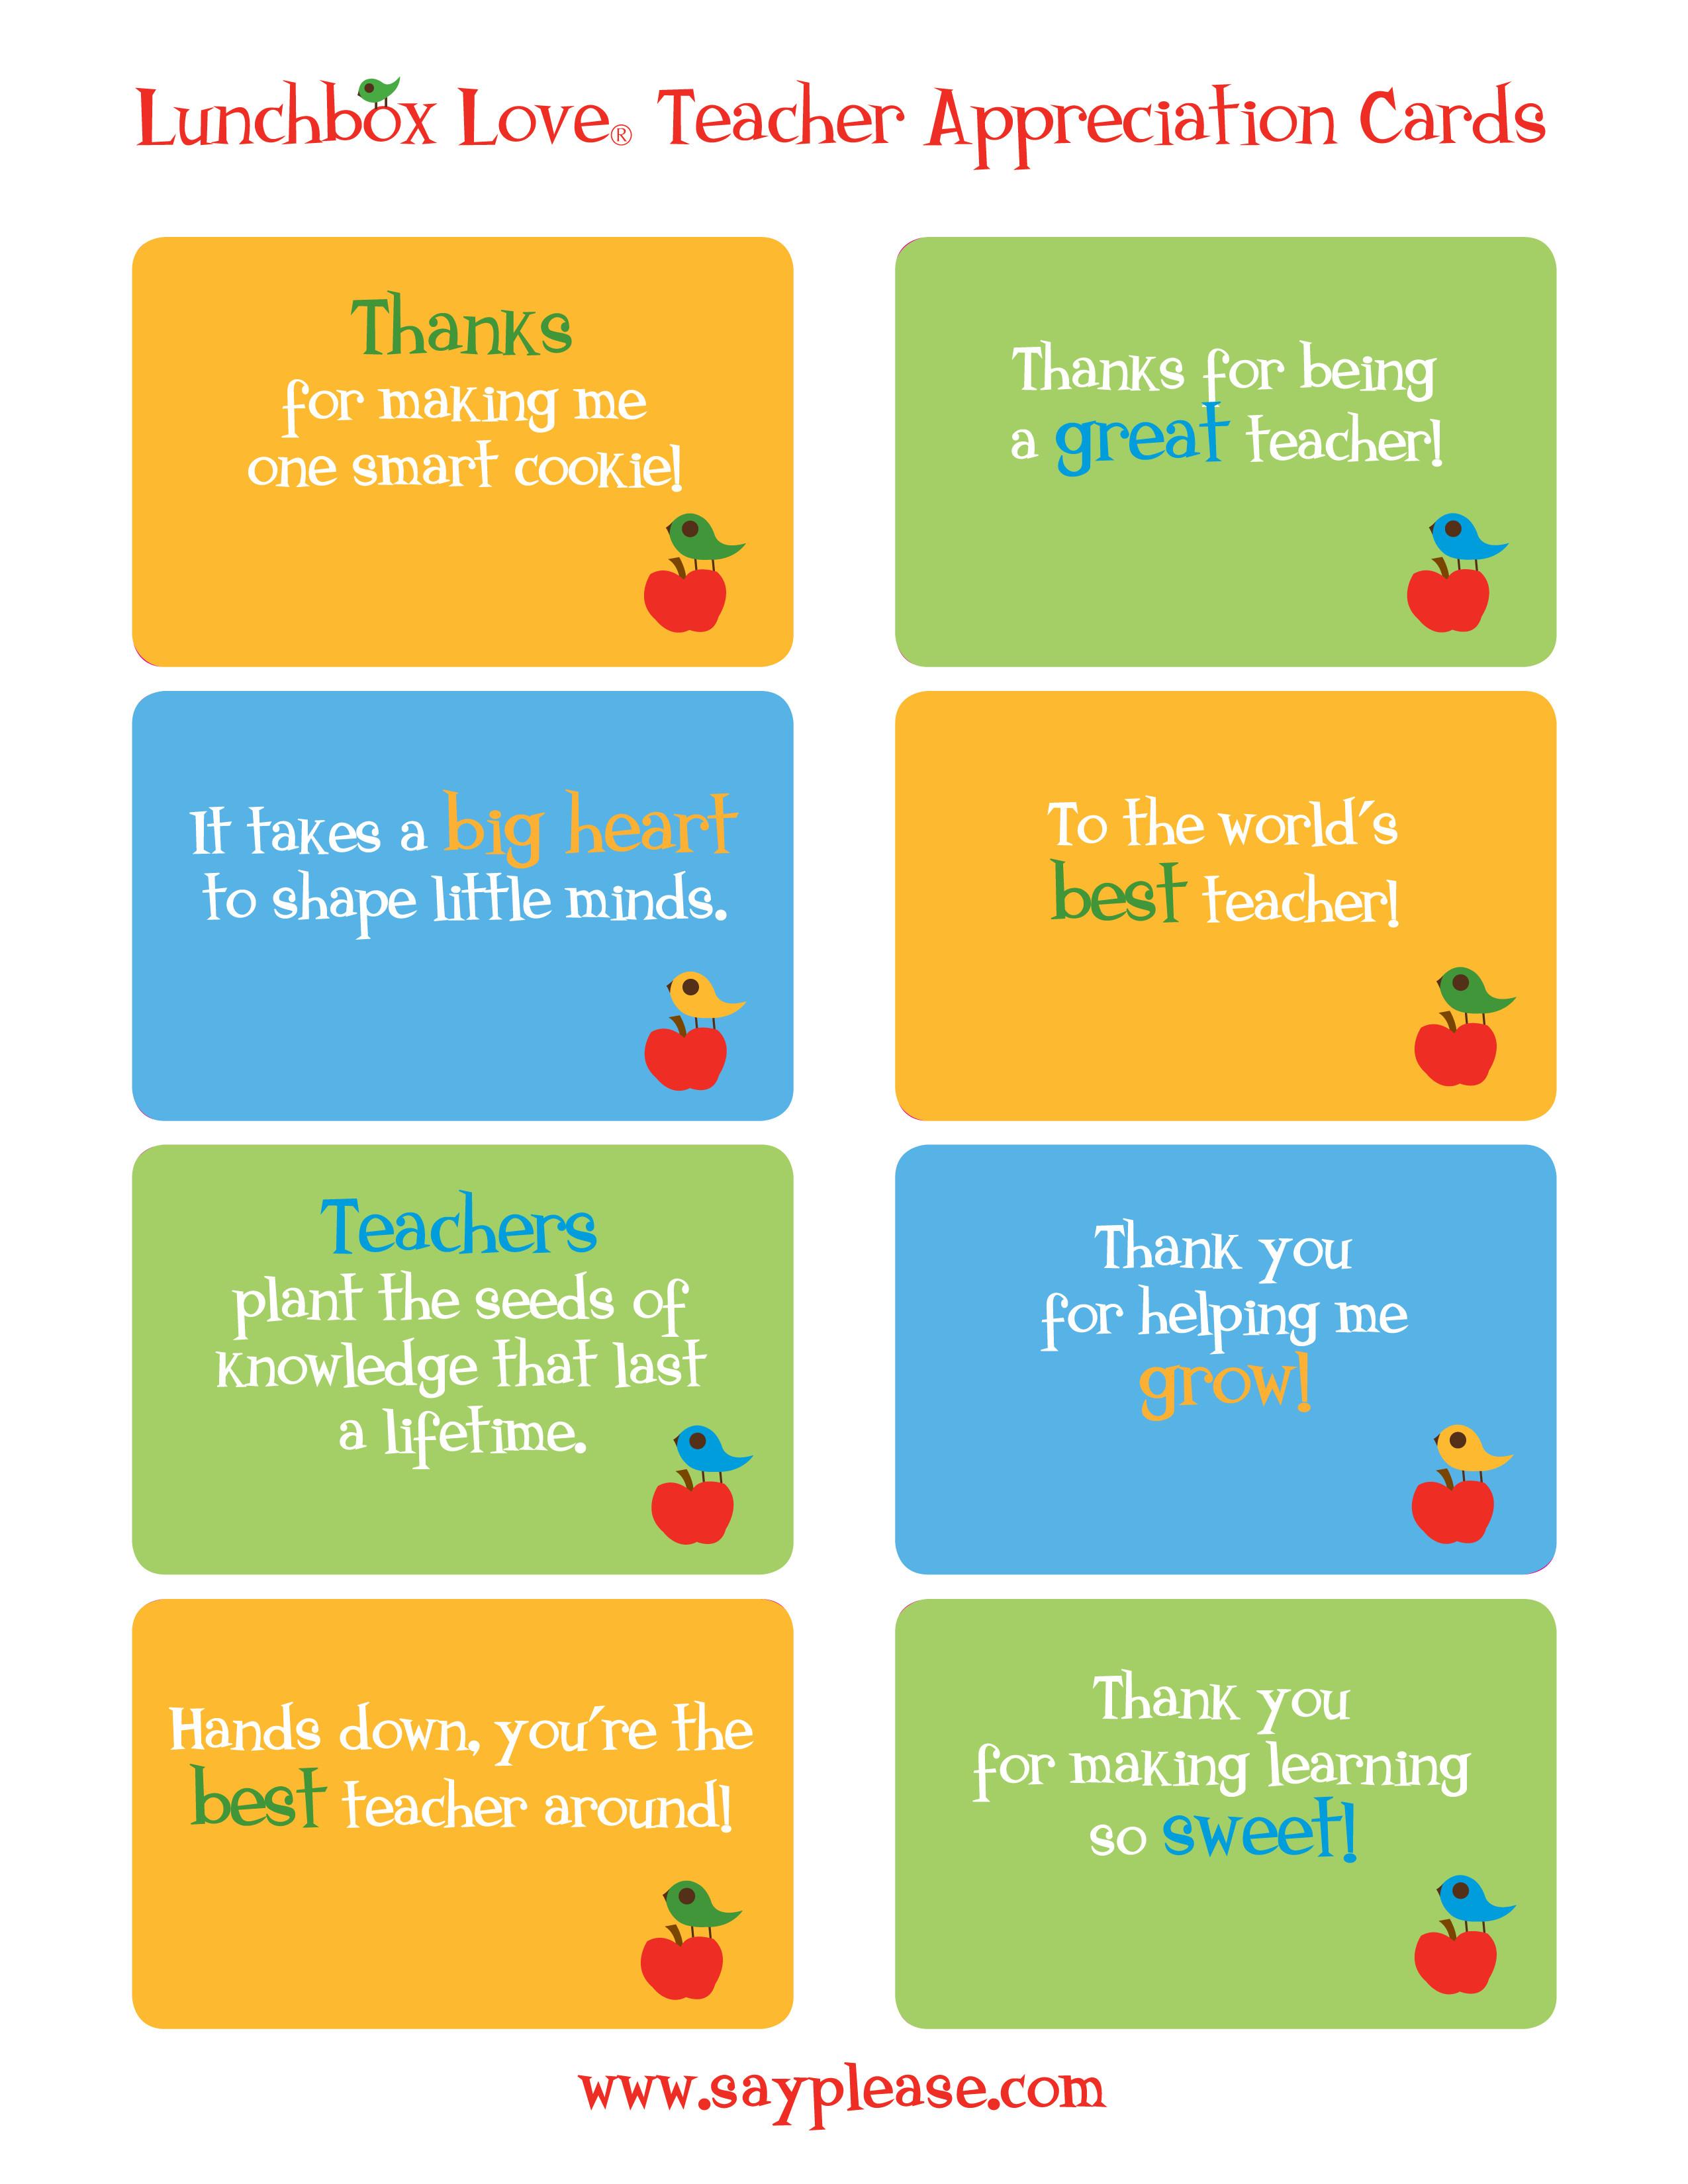 Free Printable Teacher Appreciation Cards - Classy World - Free Printable Teacher Appreciation Cards